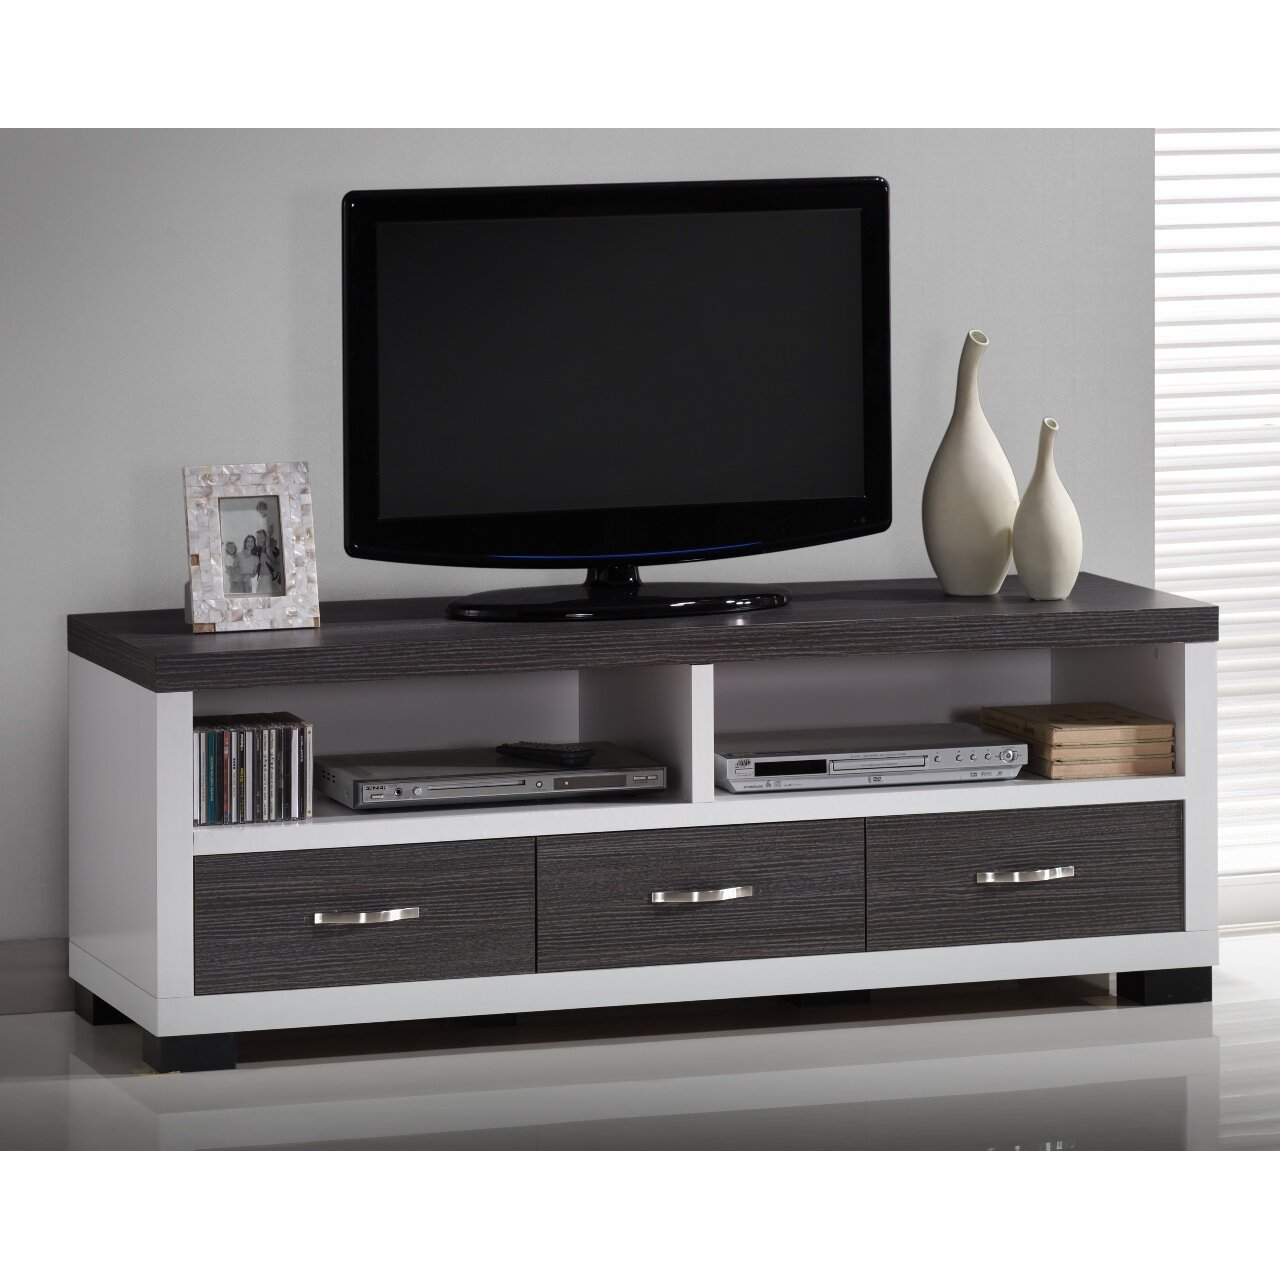 Wholesale Interiors Baxton Studio Tv Stand Amp Reviews Wayfair